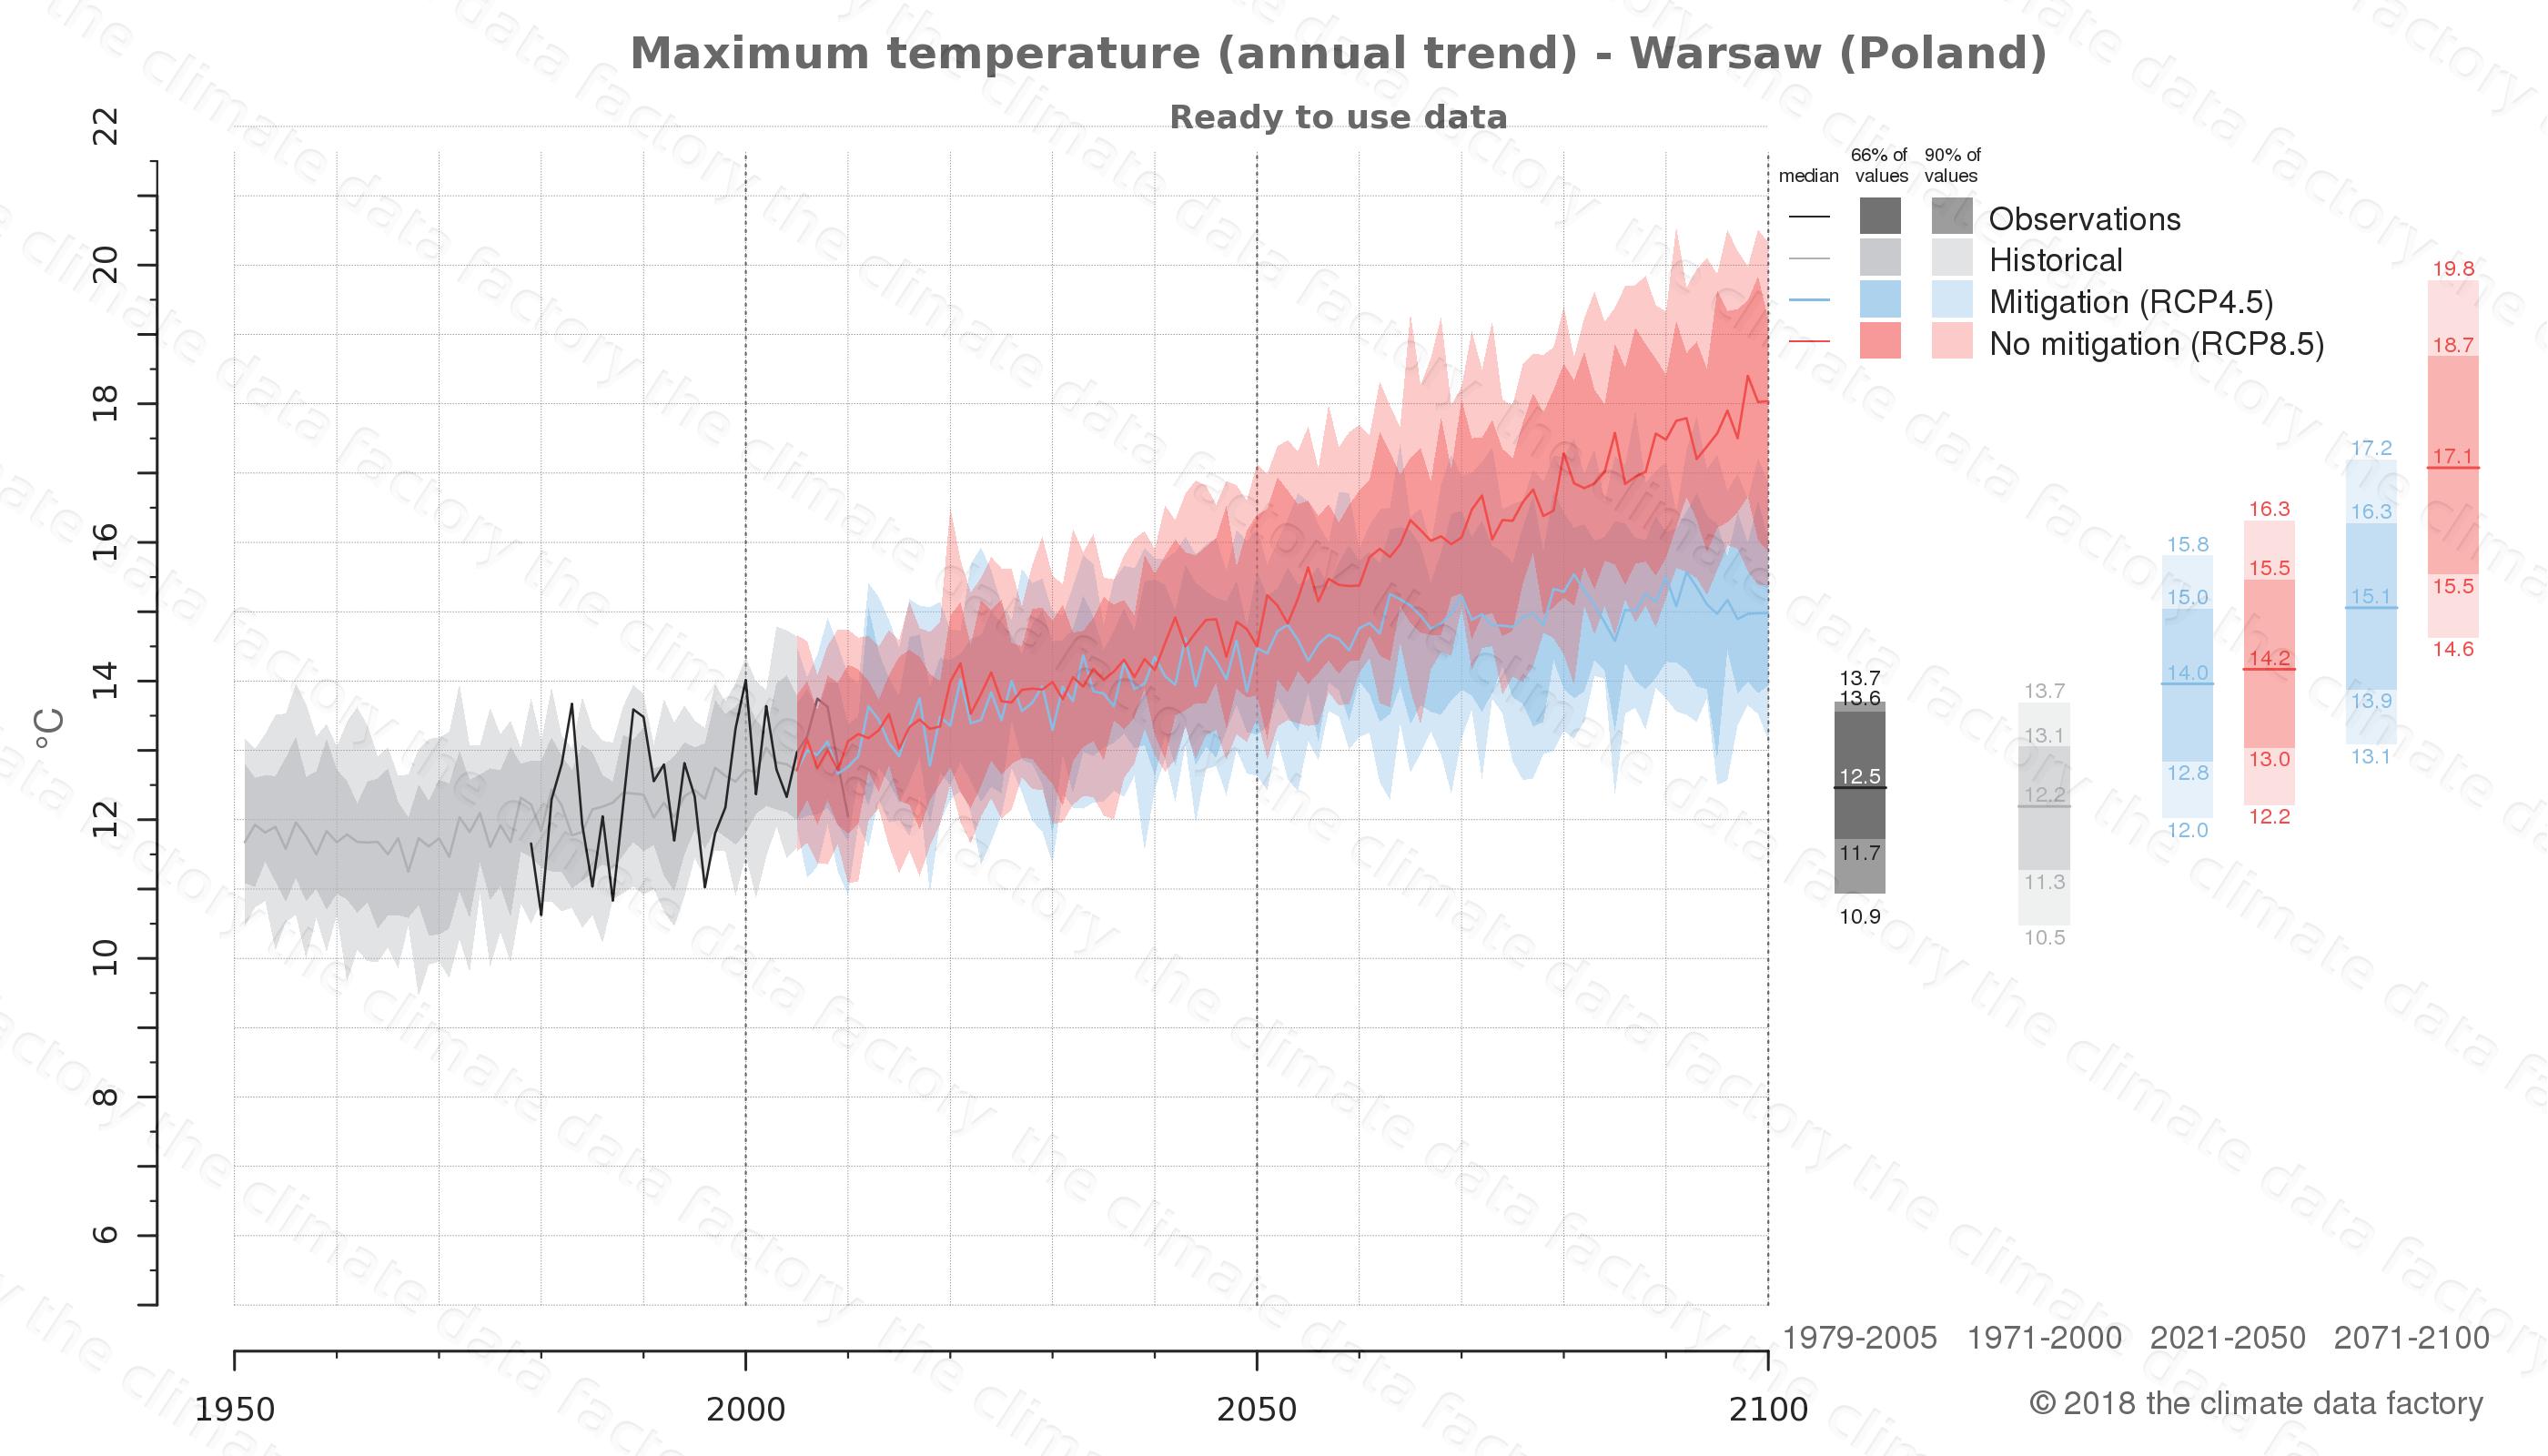 climate change data policy adaptation climate graph city data maximum-temperature warsaw poland